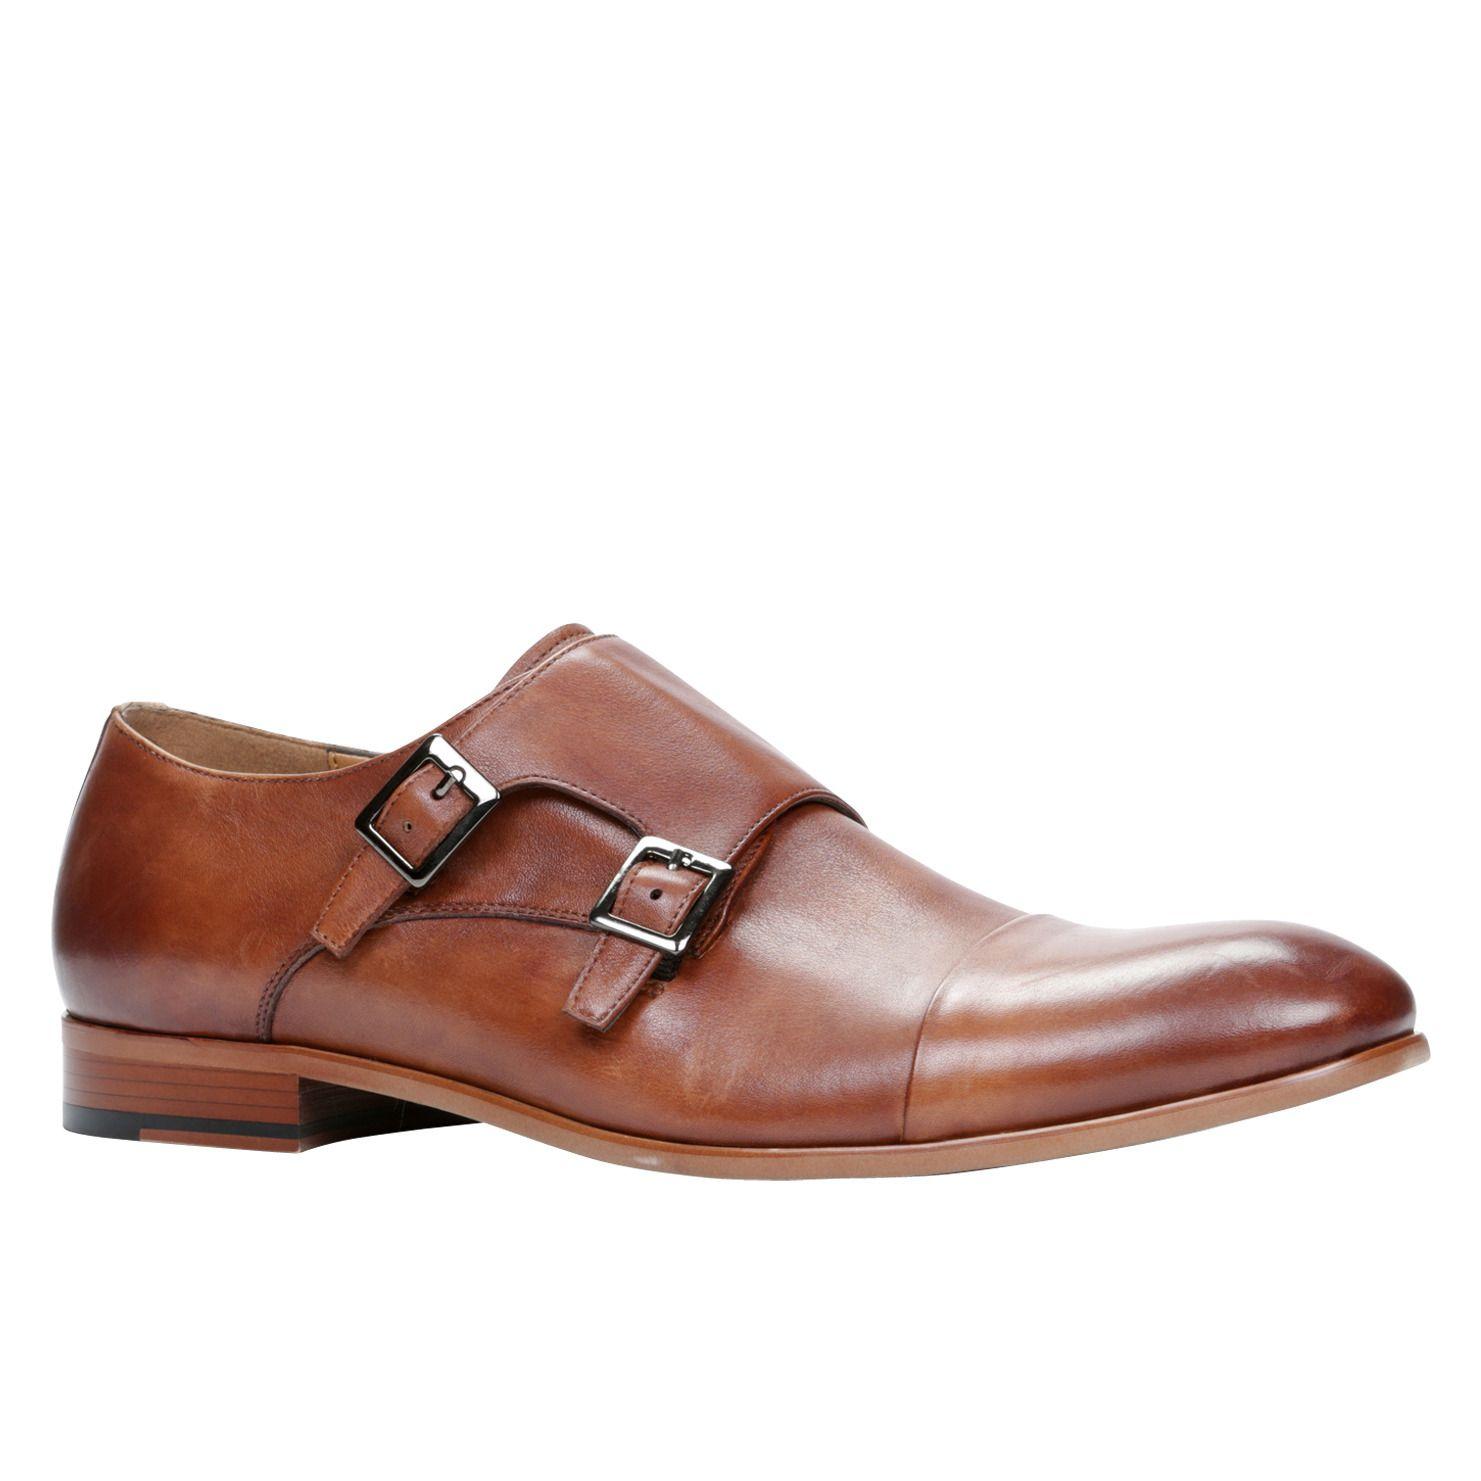 TWYFORD - men's dress loafers shoes for sale at ALDO Shoes. | Men ...